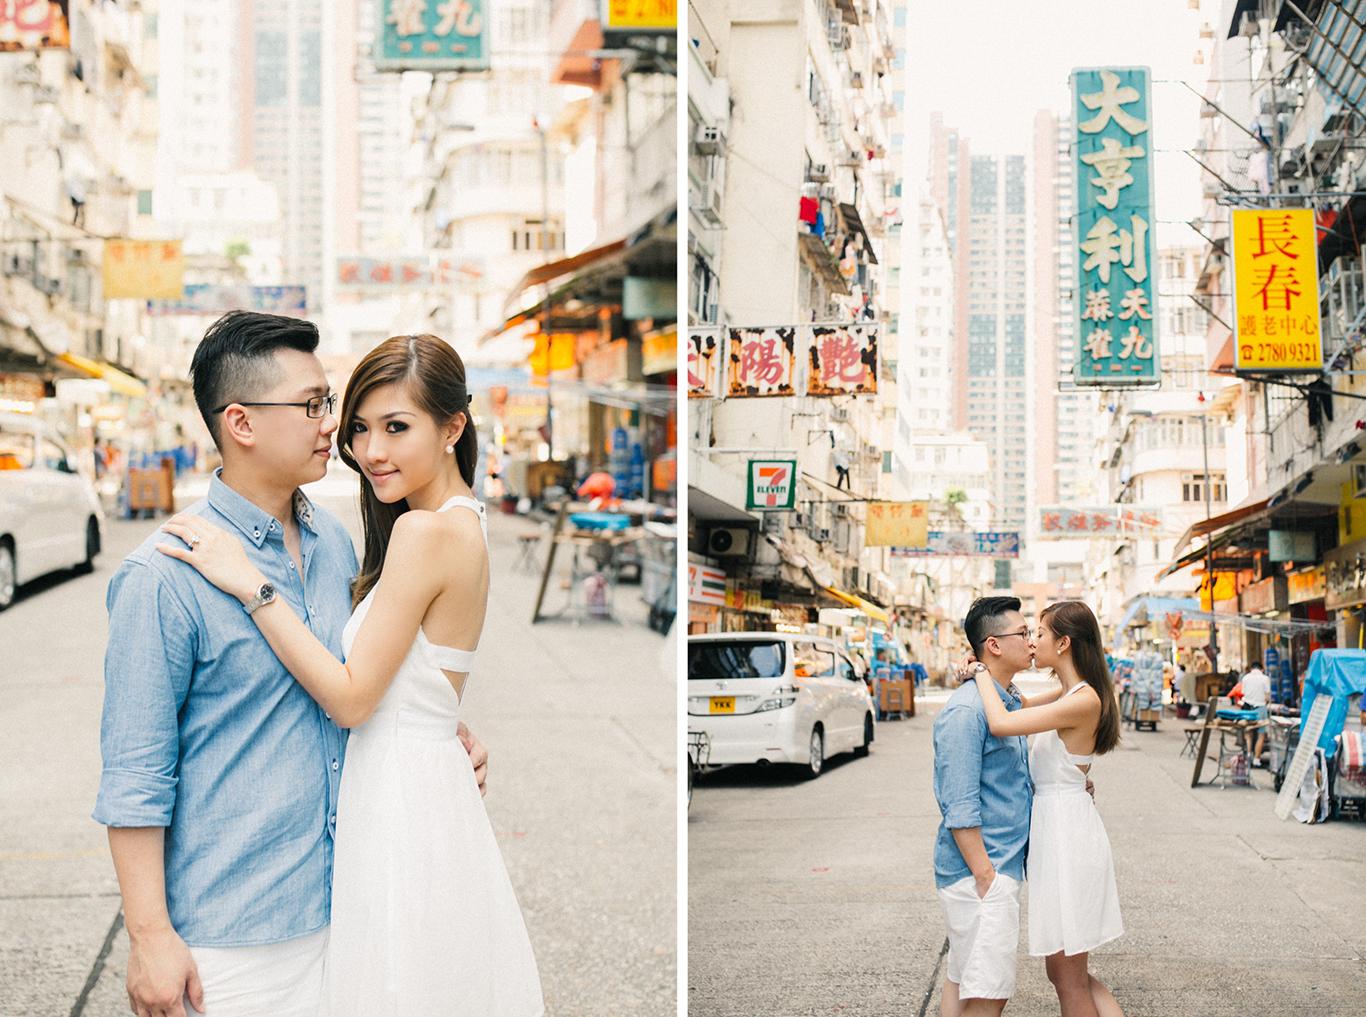 16-hellojanelee-natalie-hongkong-malaysia-engagement-prewedding